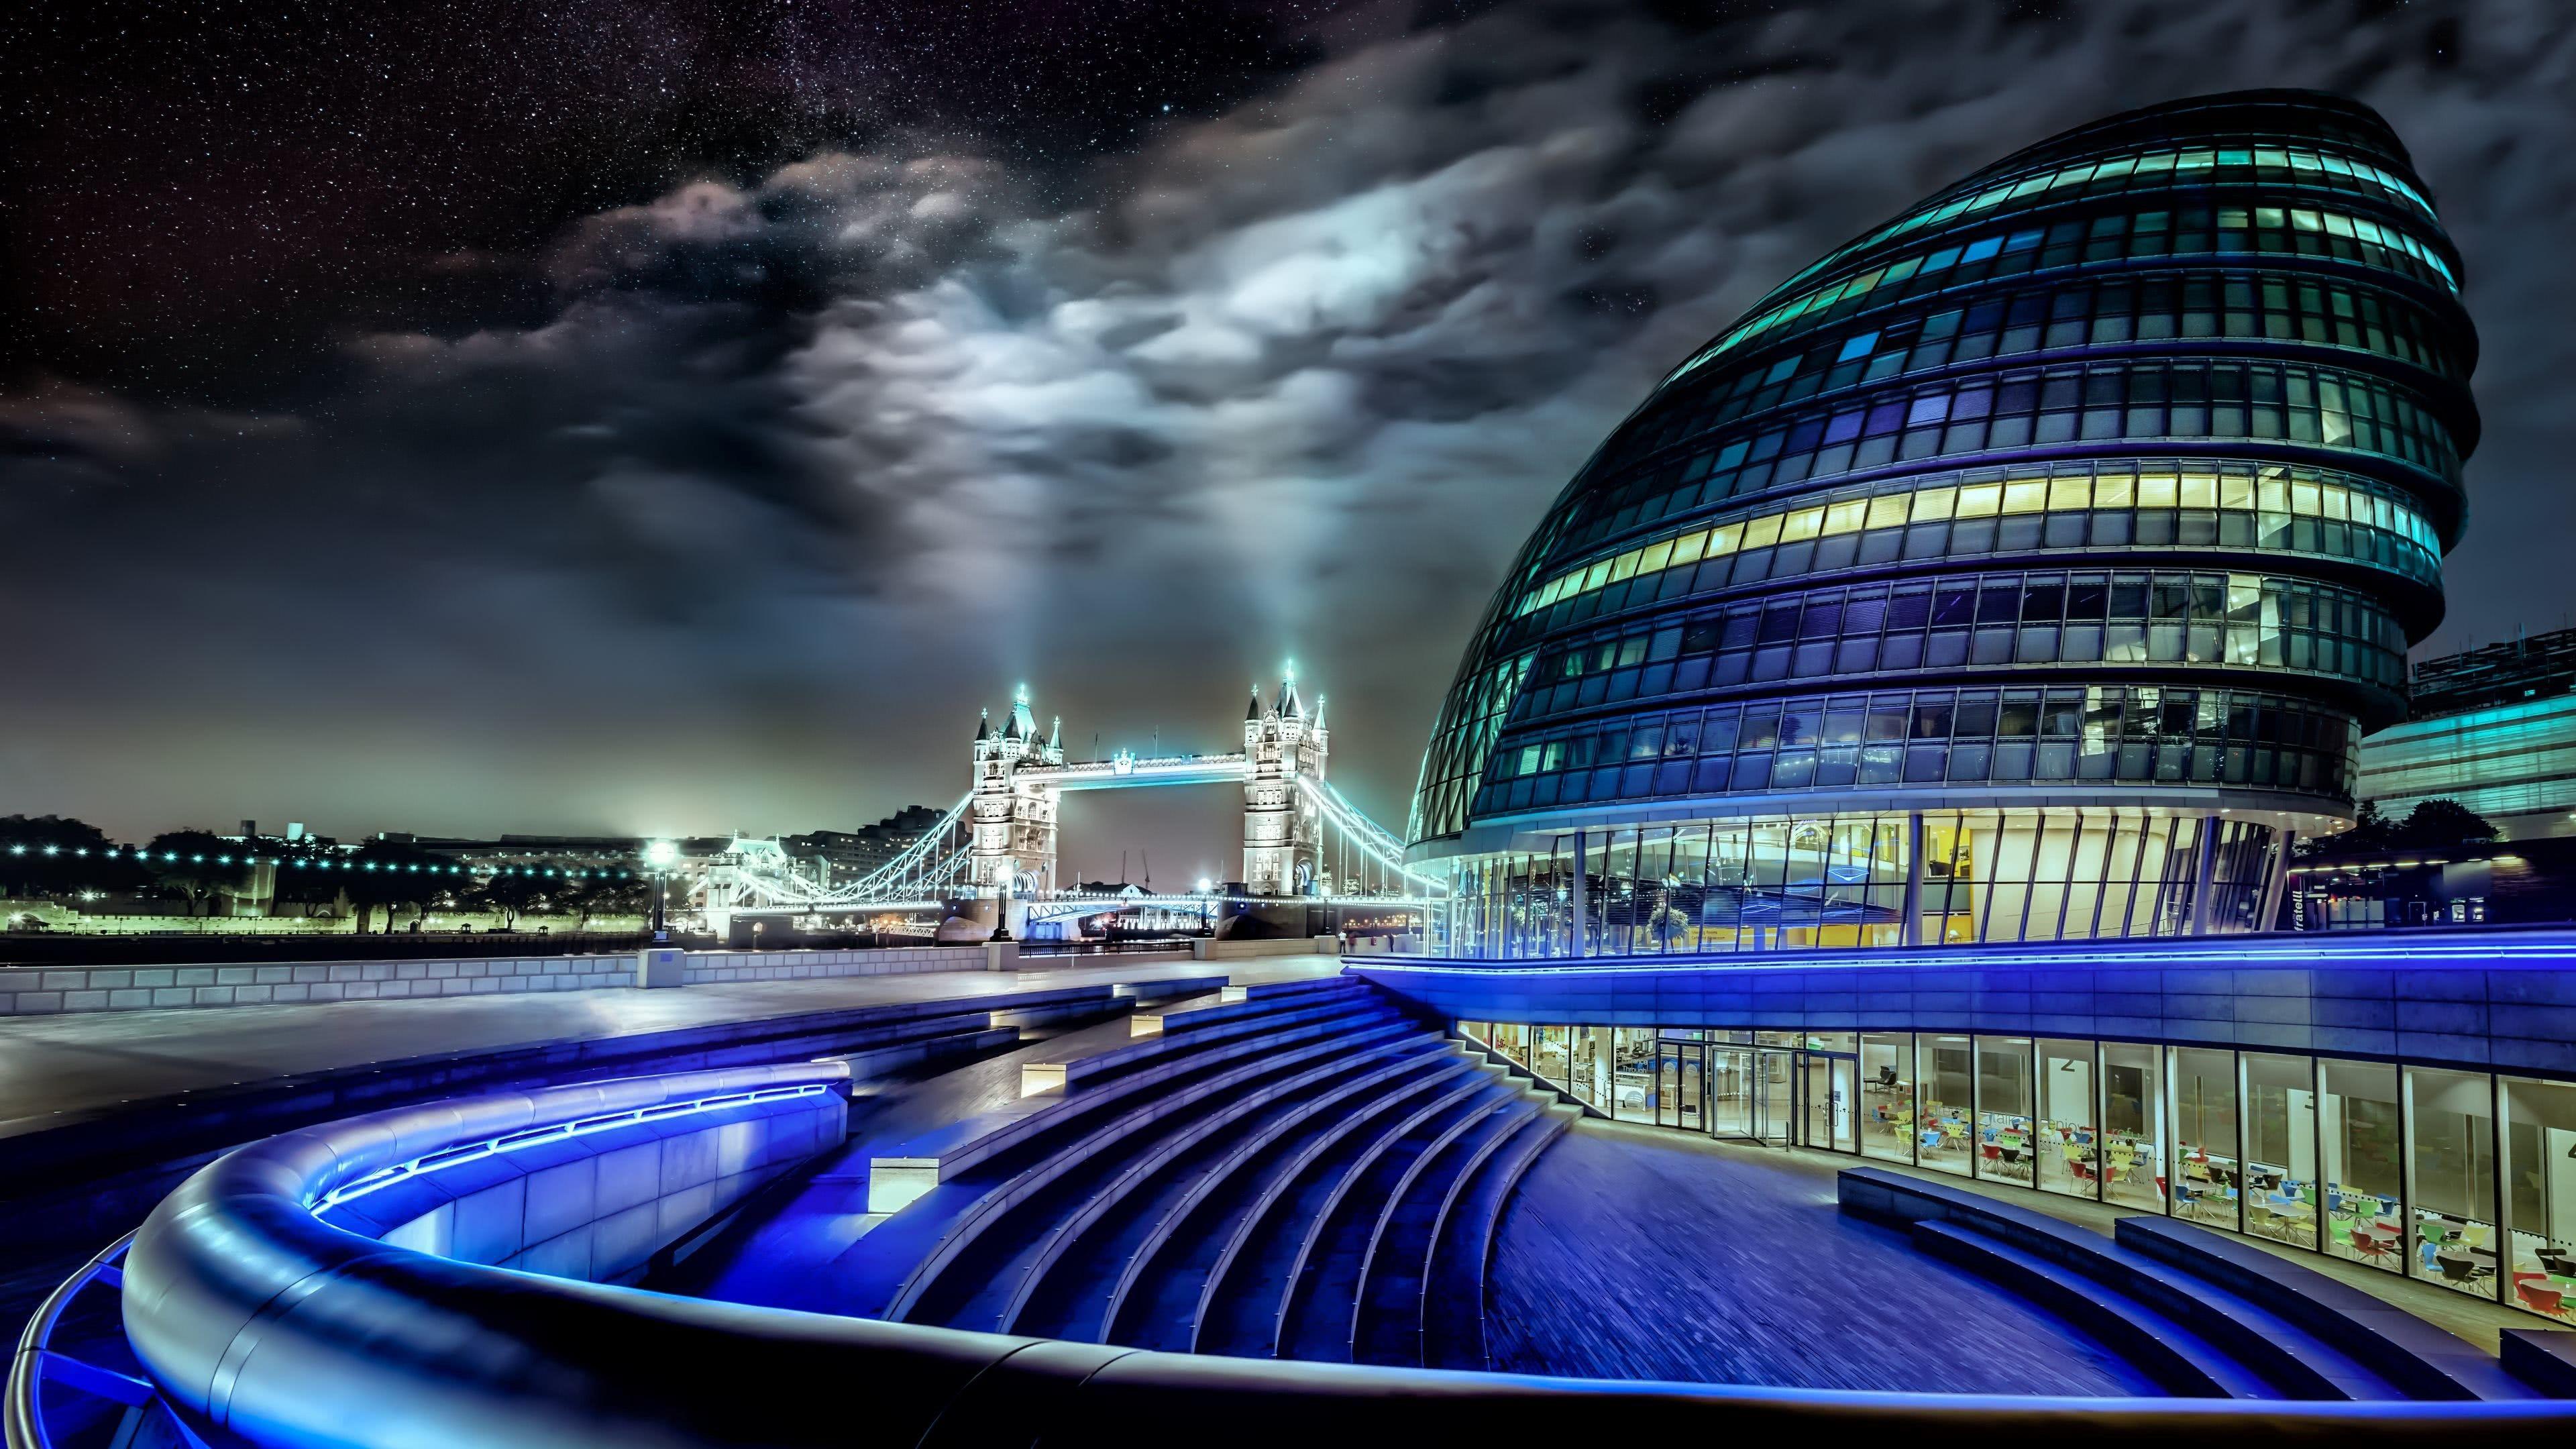 City Hall At Night London, United Kingdom UHD 4K Wallpaper ...